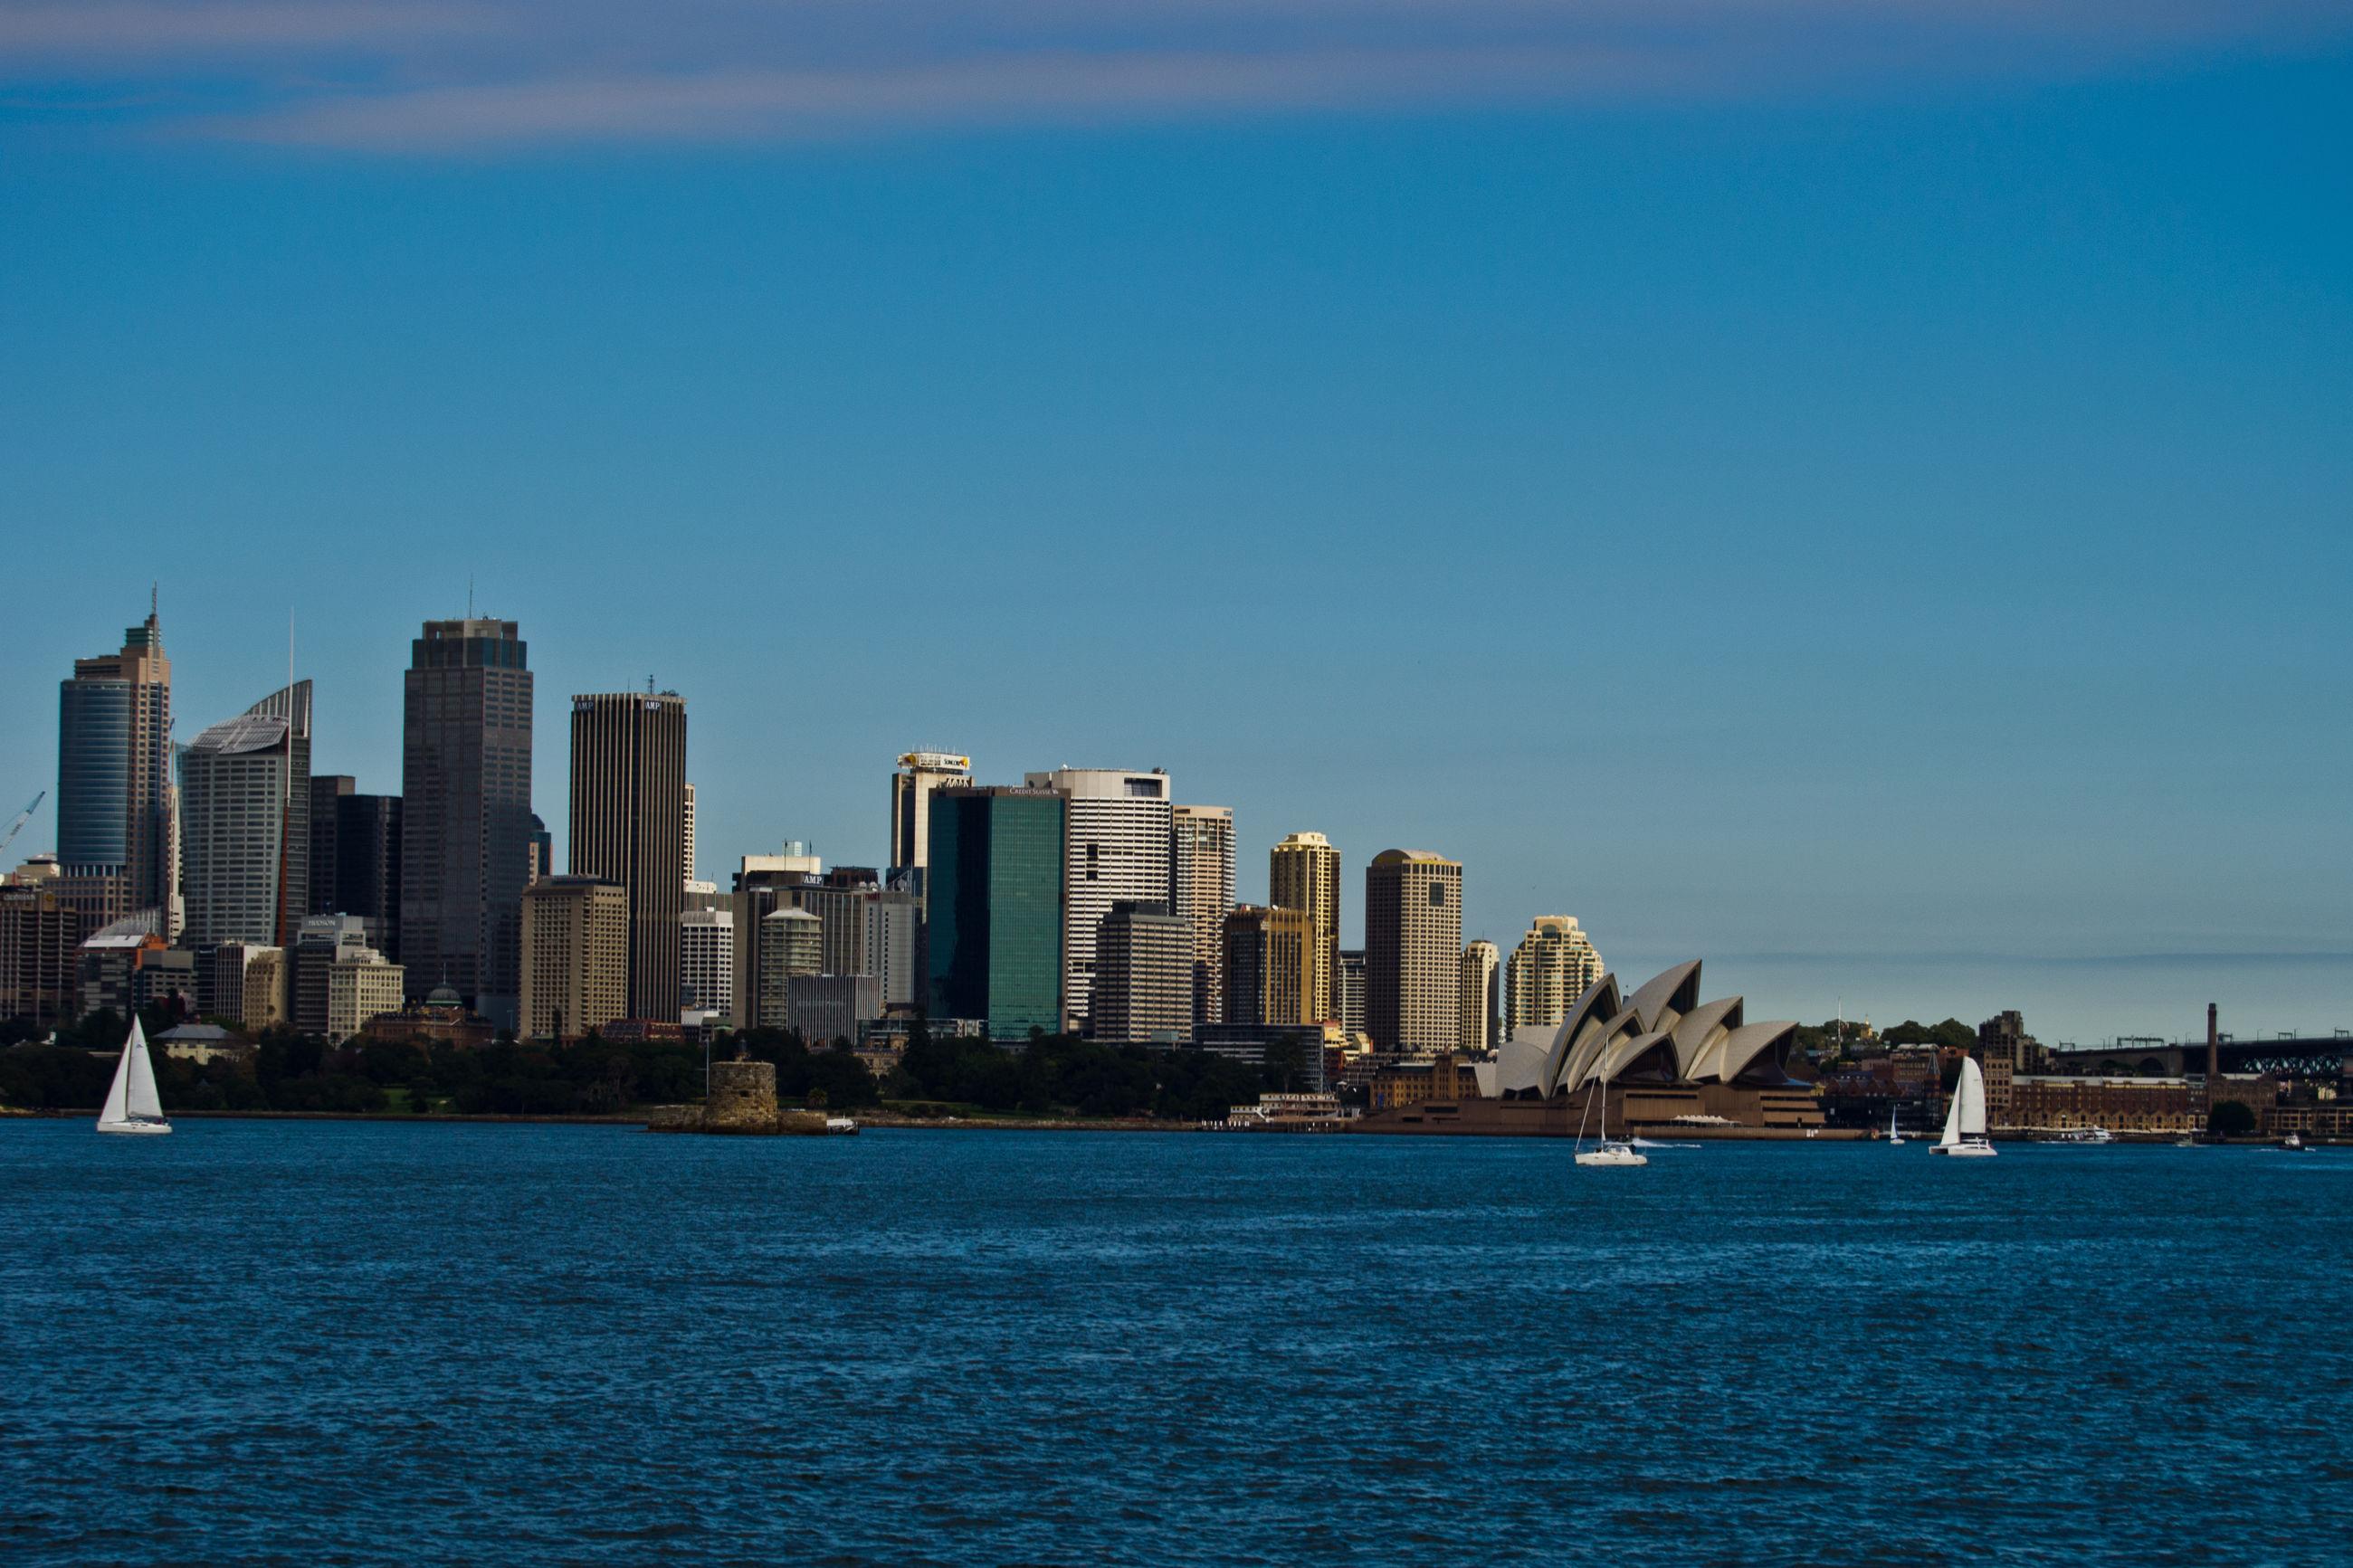 SEA BY CITY BUILDINGS AGAINST CLEAR BLUE SKY